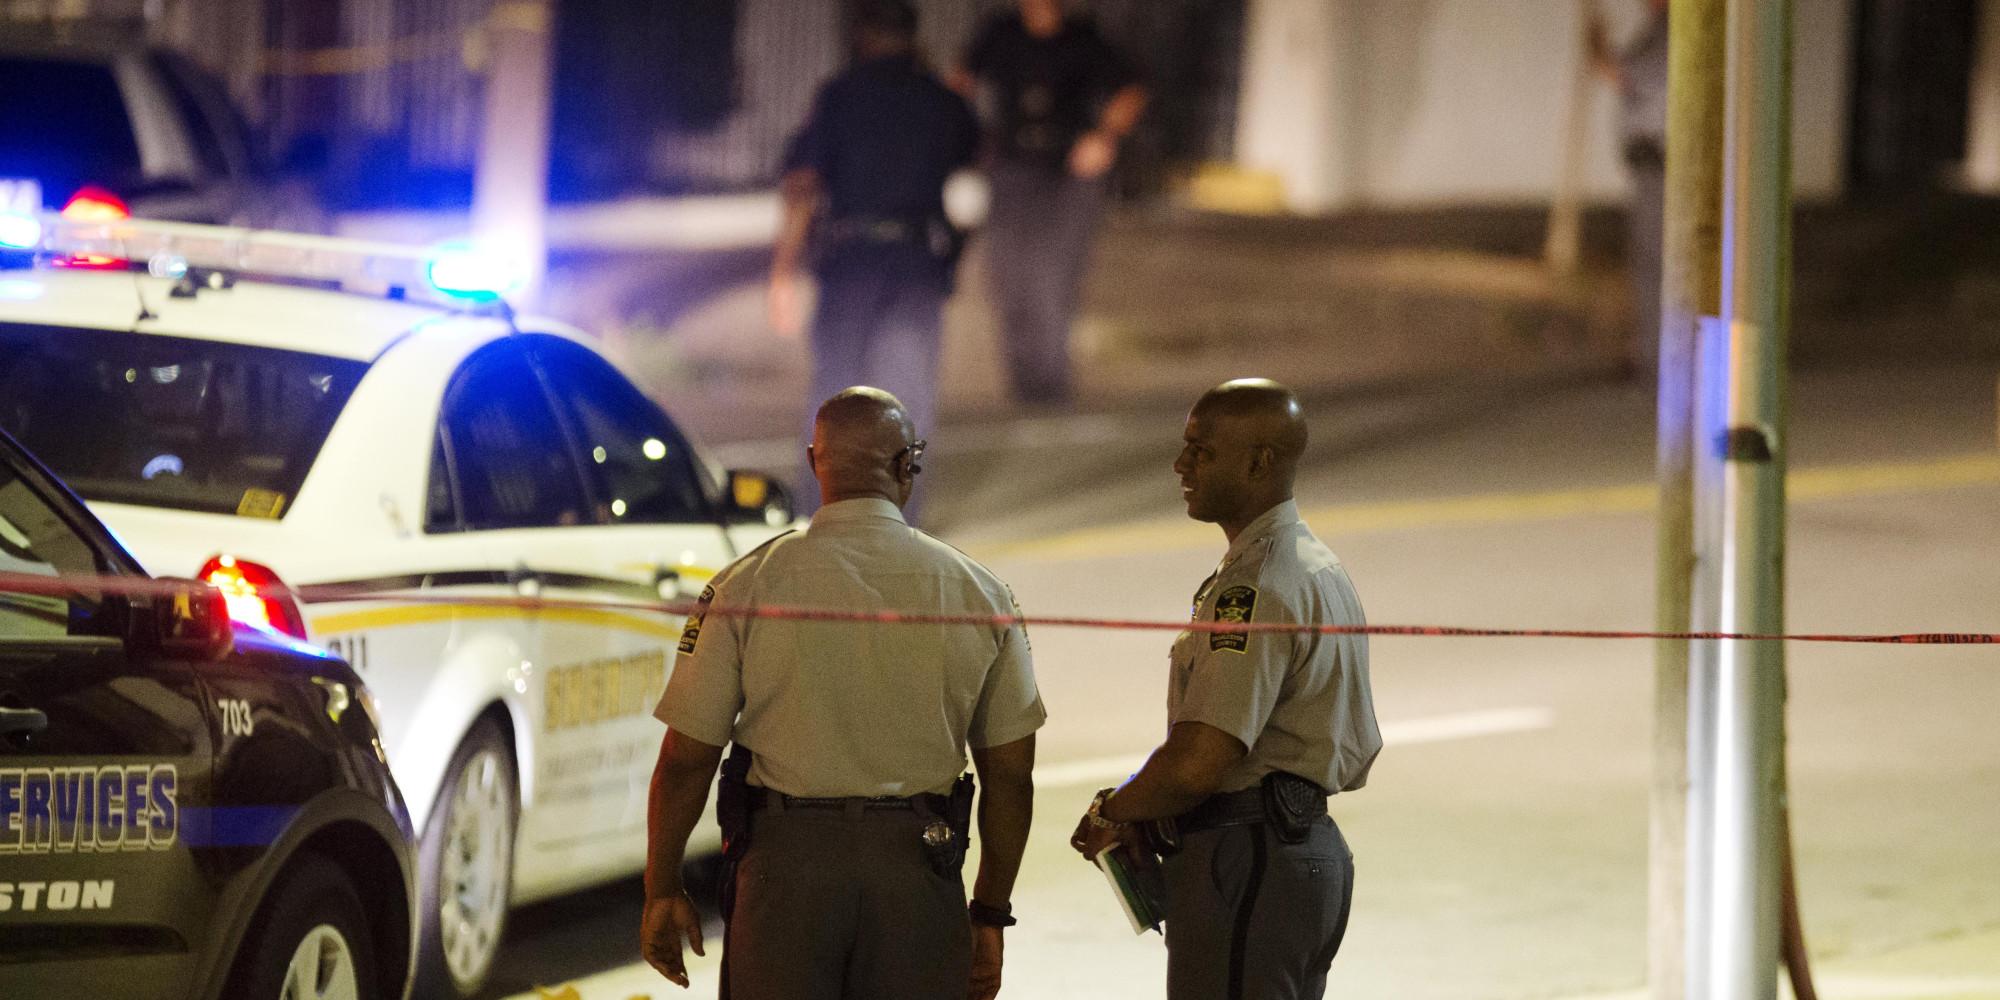 Charleston Church Shooting White Gunman Kills 9 At